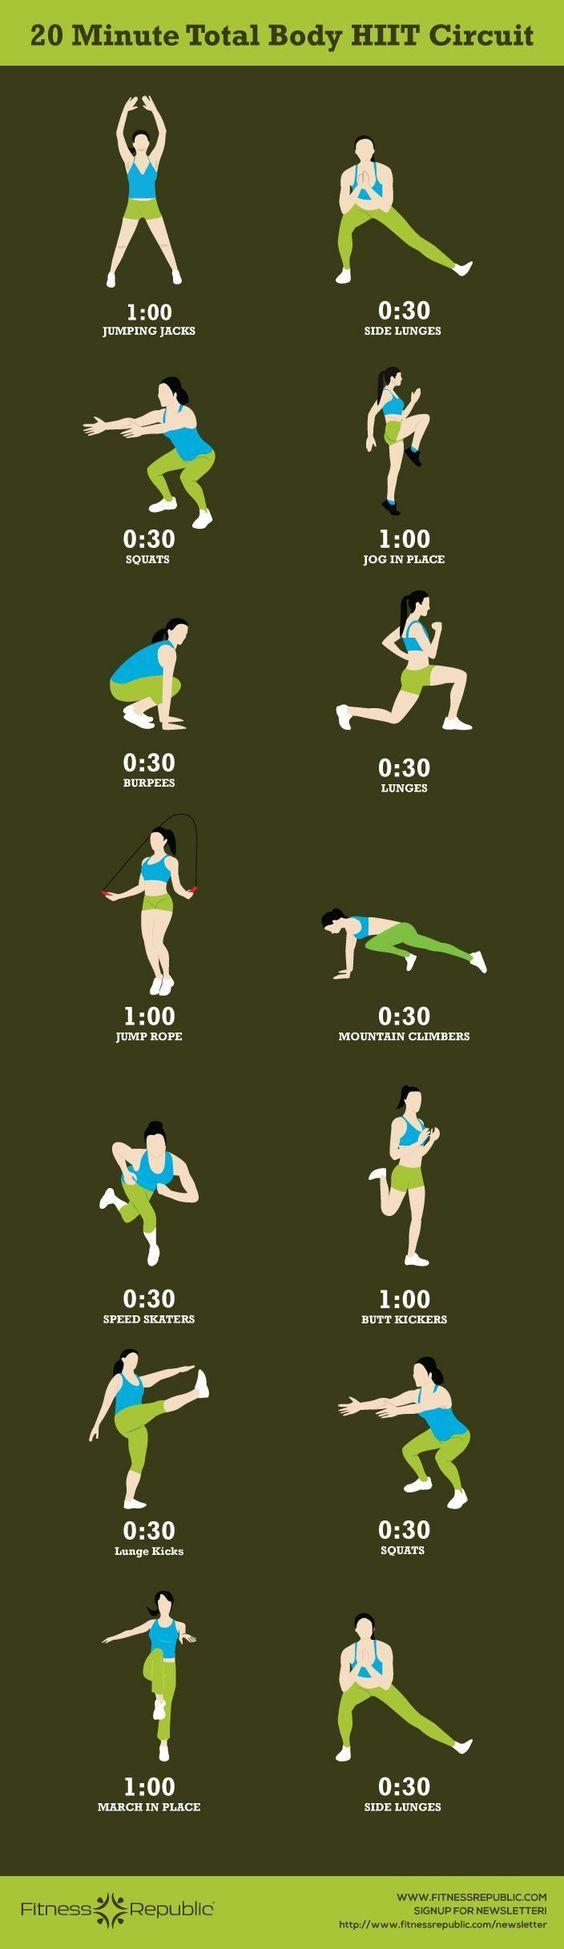 20-Minute Total Body HIIT Circuit